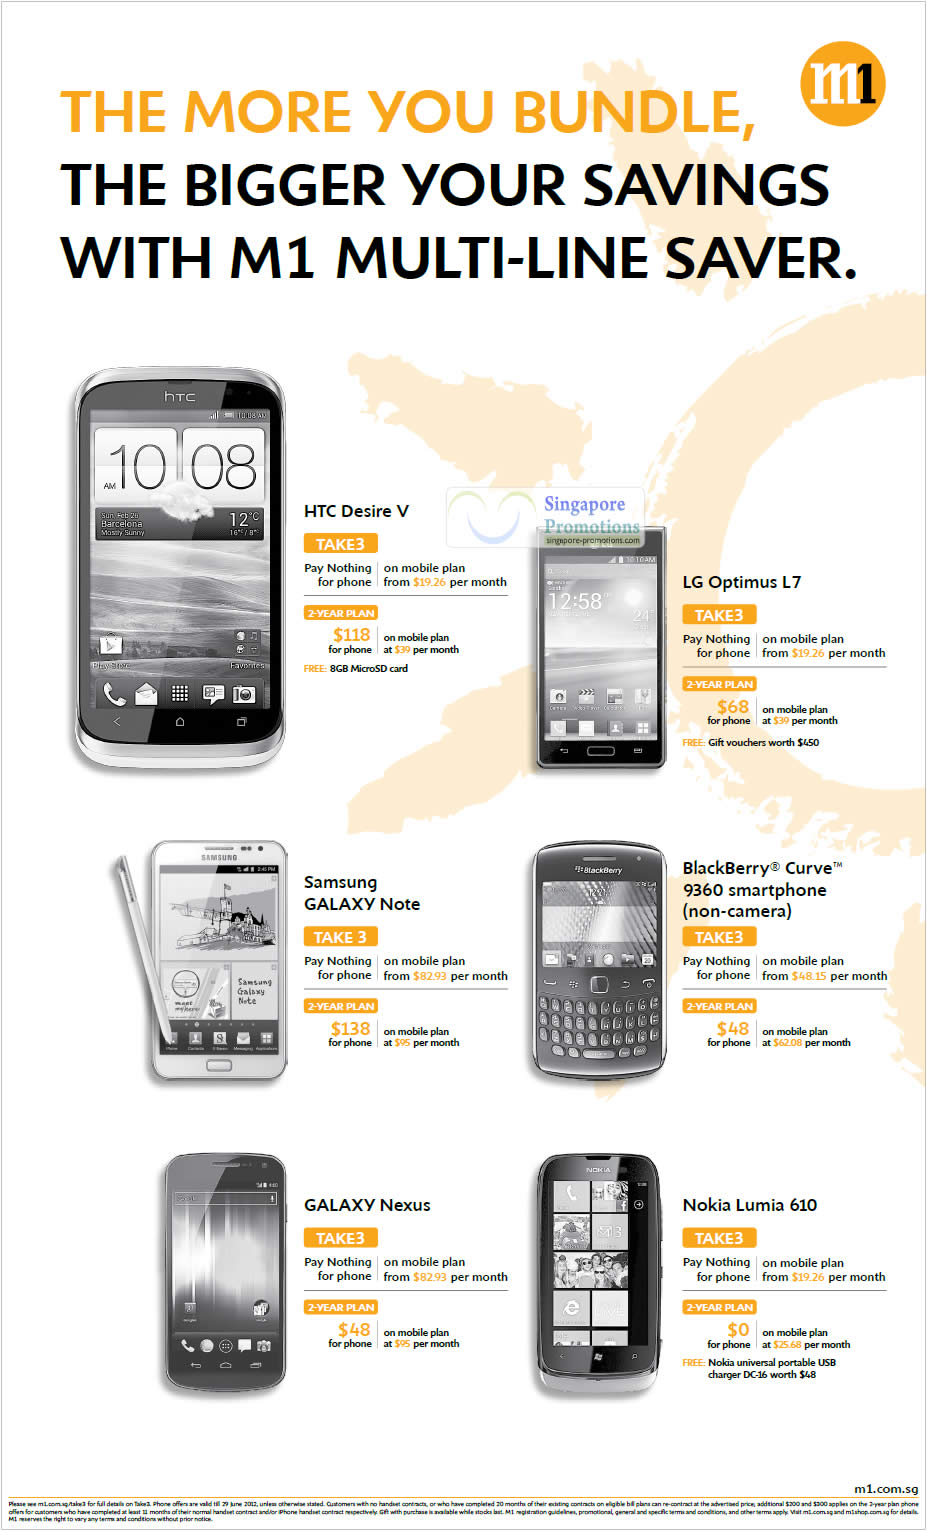 HTC Desire V, LG Optimus L7, Samsung Galaxy Note, Blackberry Curve 9360, Galaxy Nexus, Nokia Lumia 610